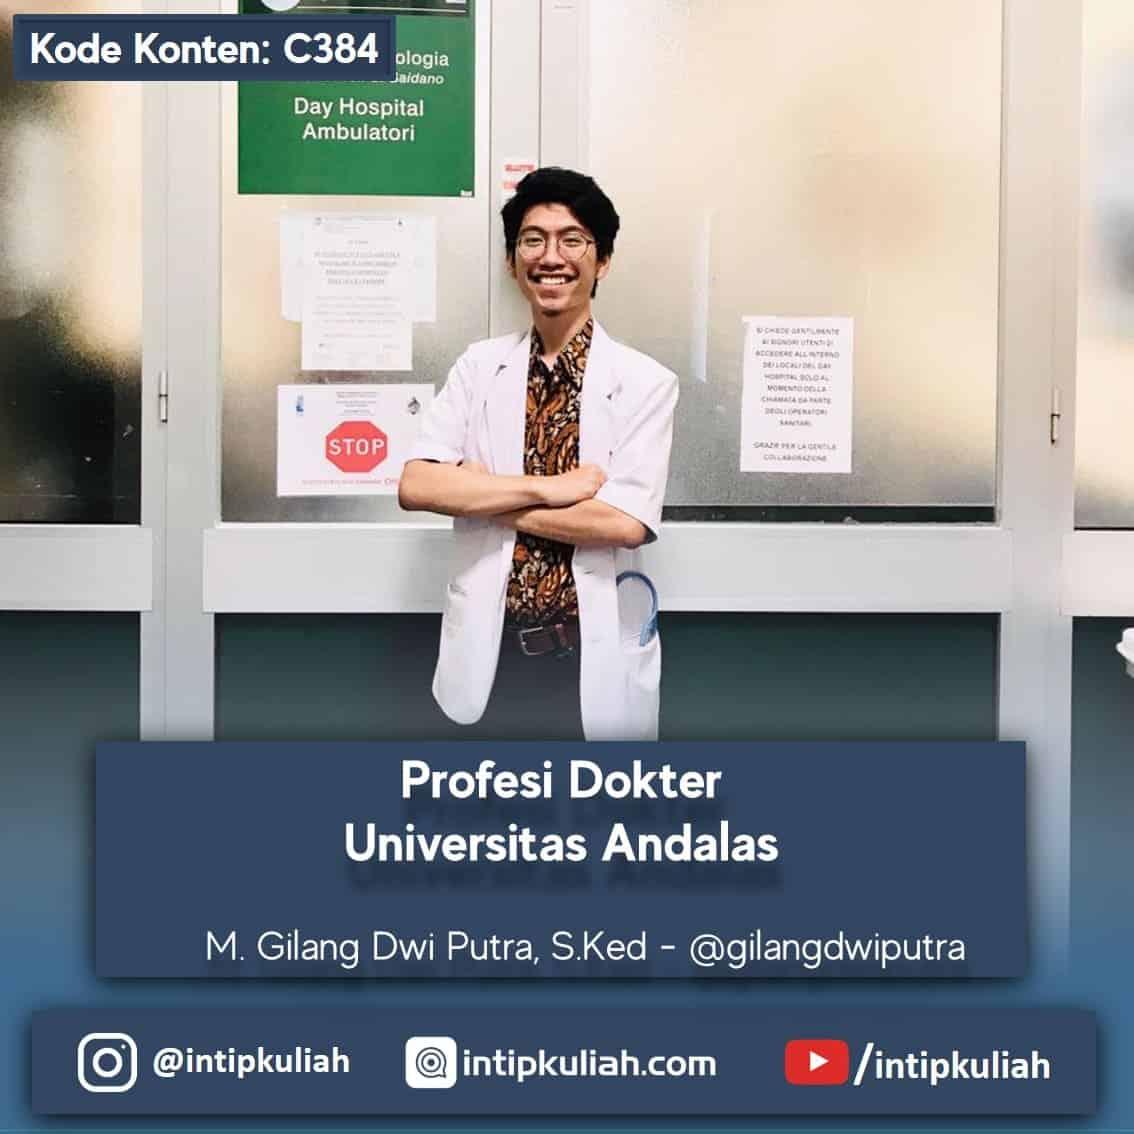 Profesi Dokter Universitas Andalas (Gilang)